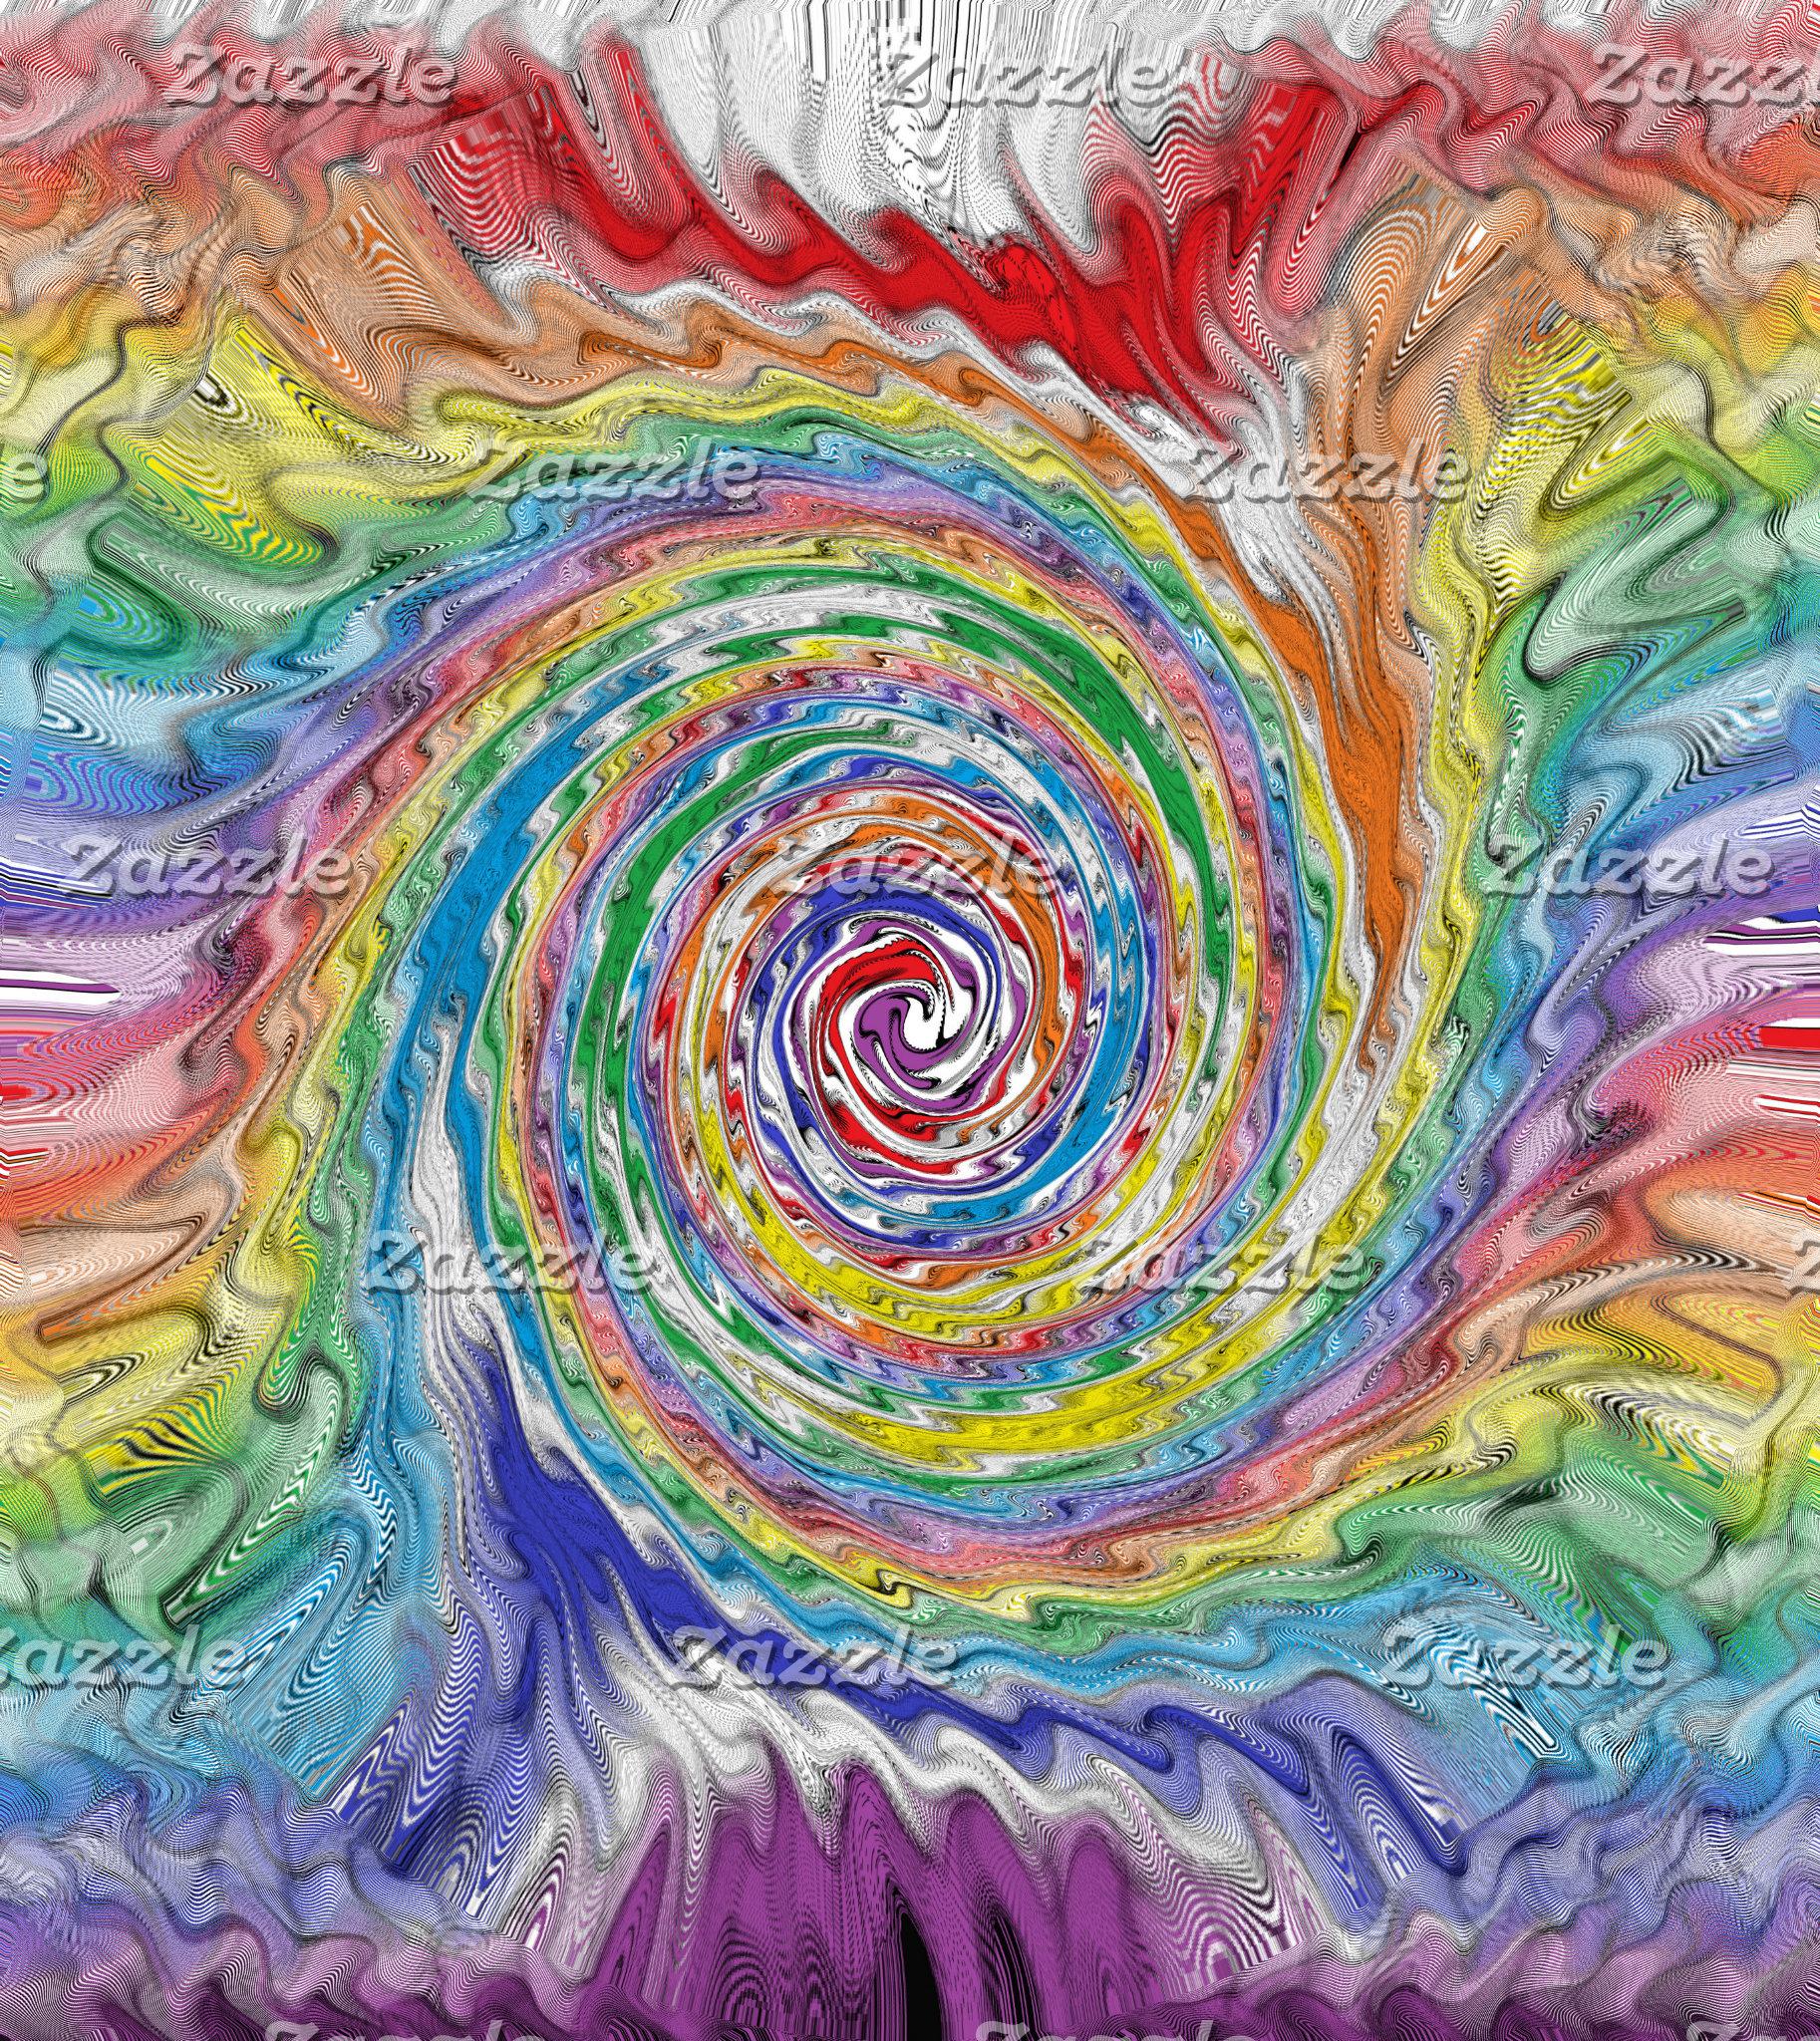 A Colorful Splatter